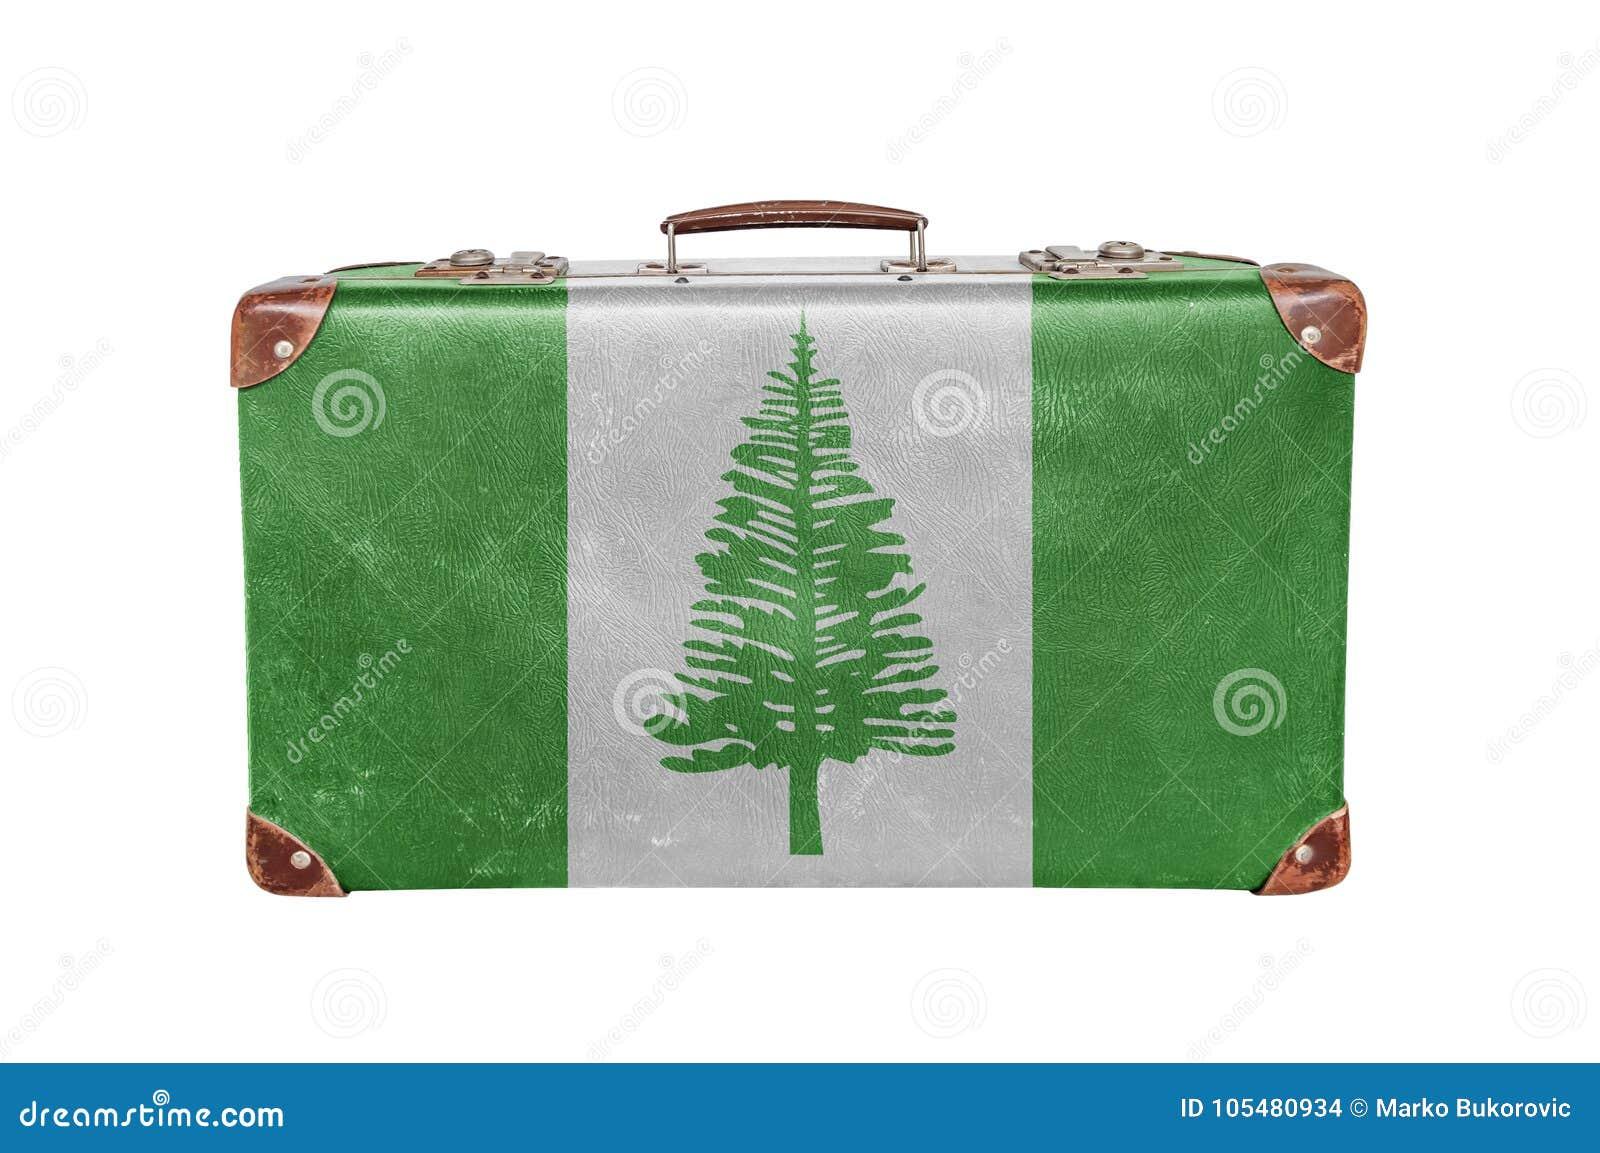 Vintage suitcase with Norfolk Island flag